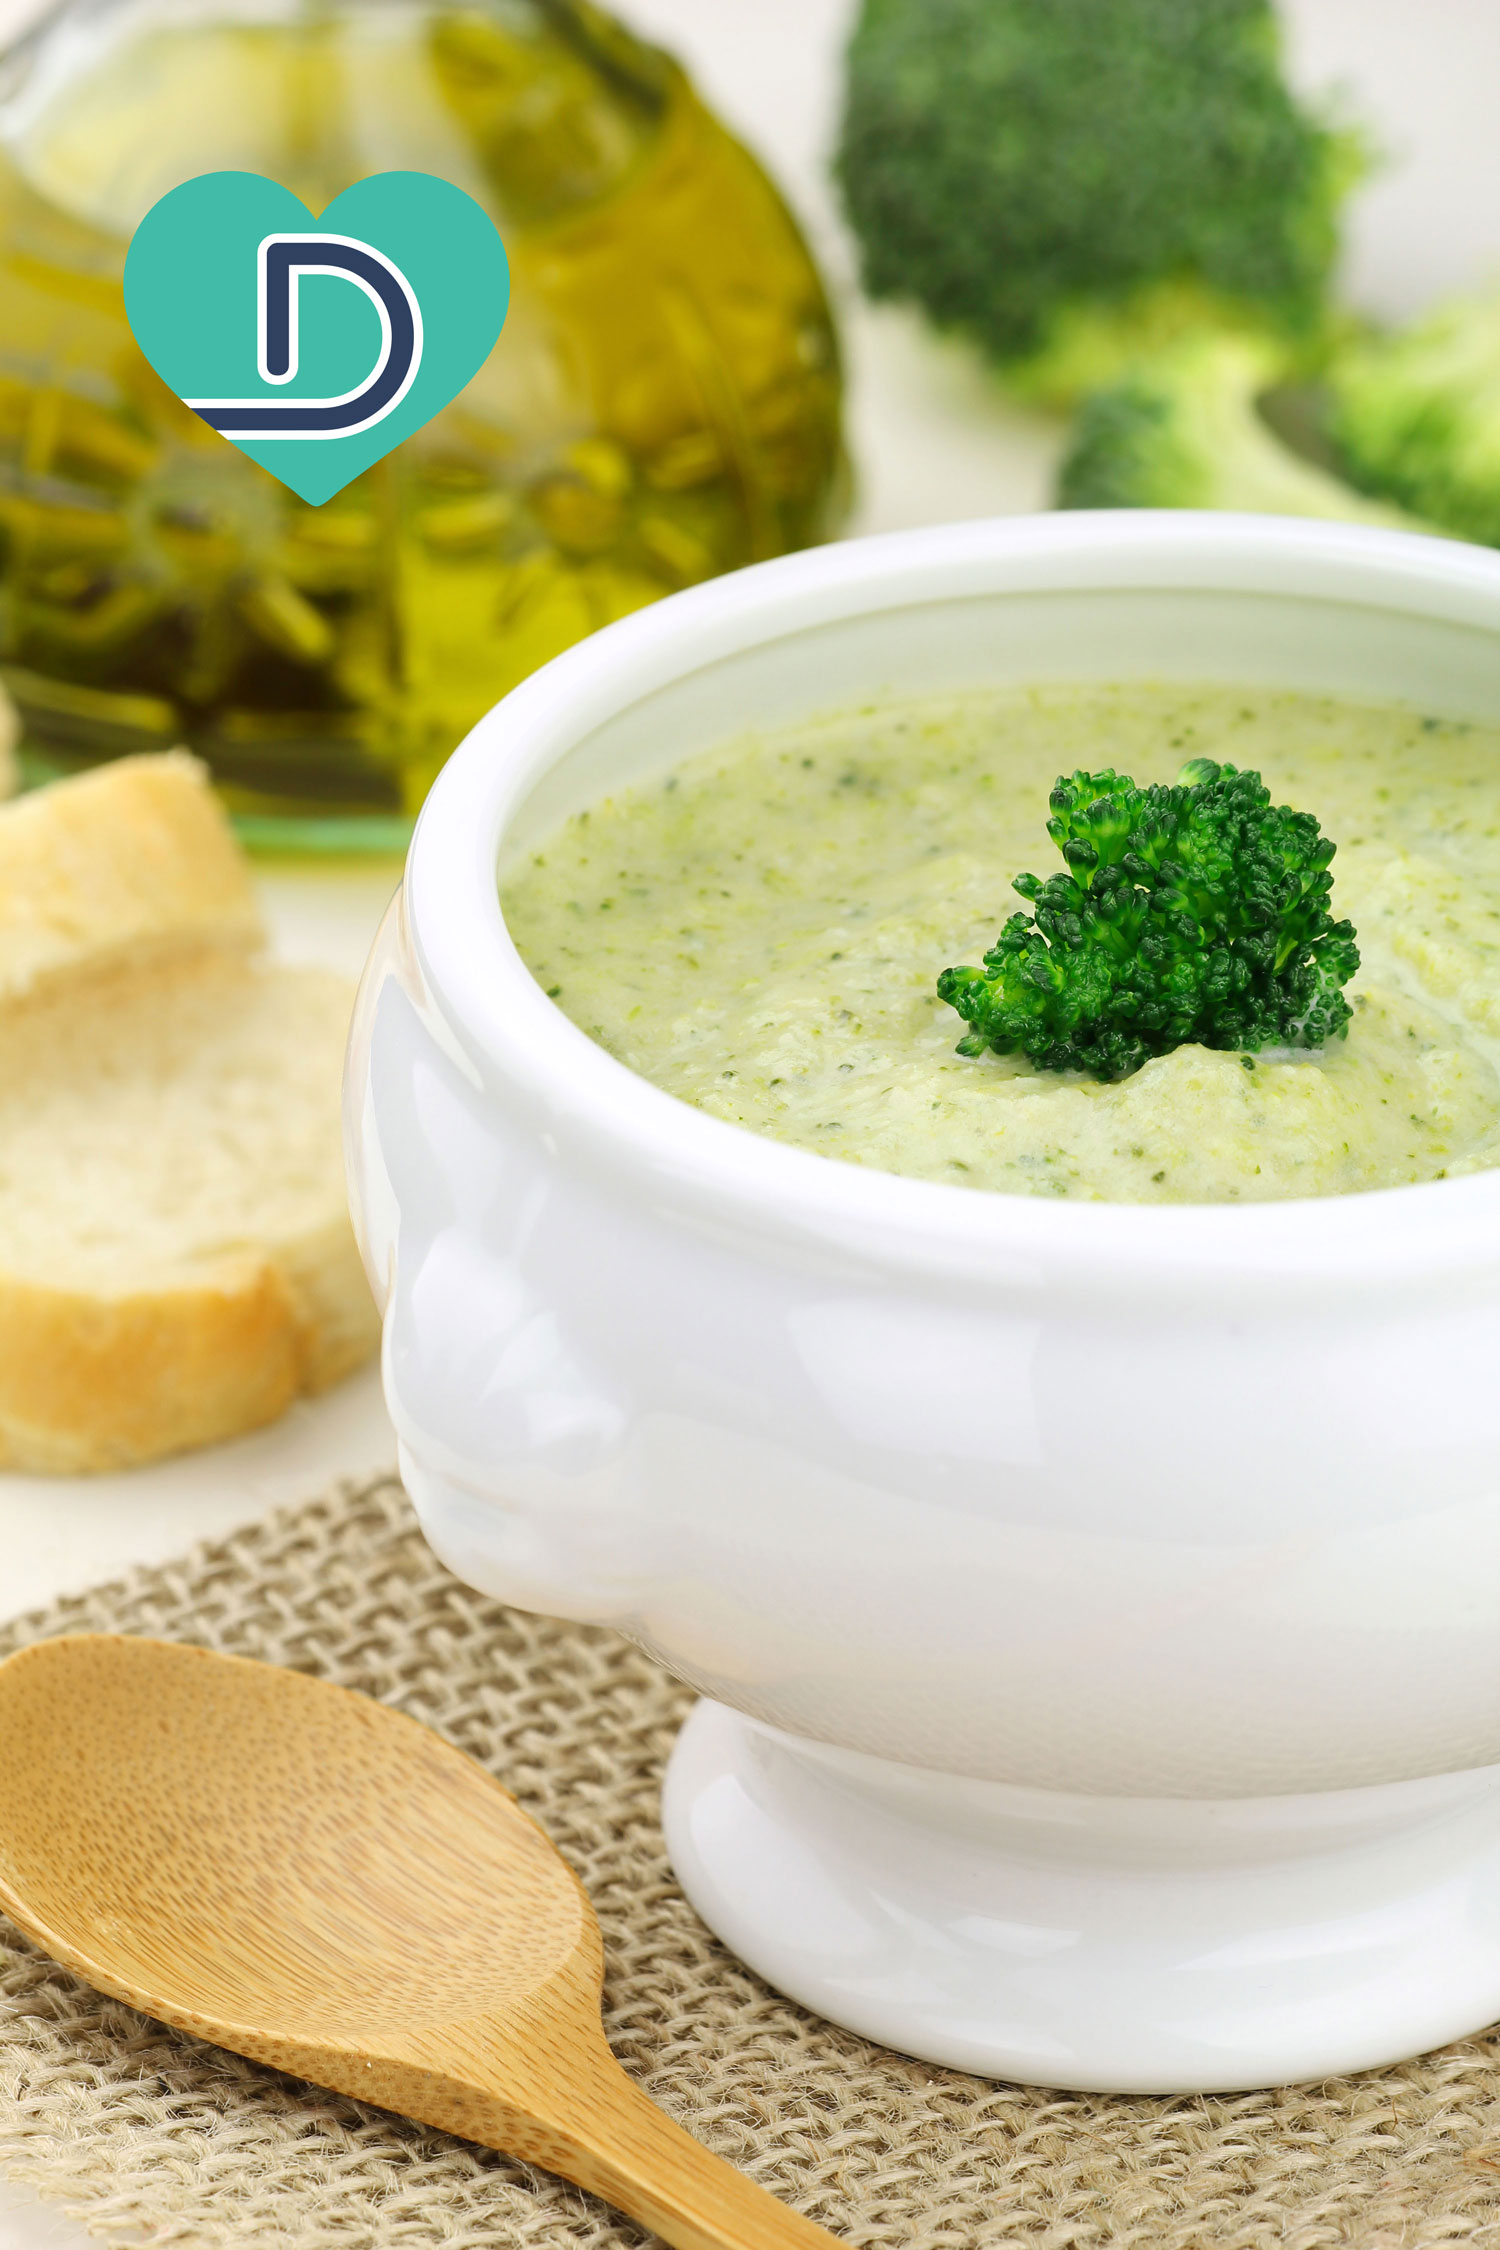 Dr. Dave's Broccoli Cauliflower Soup